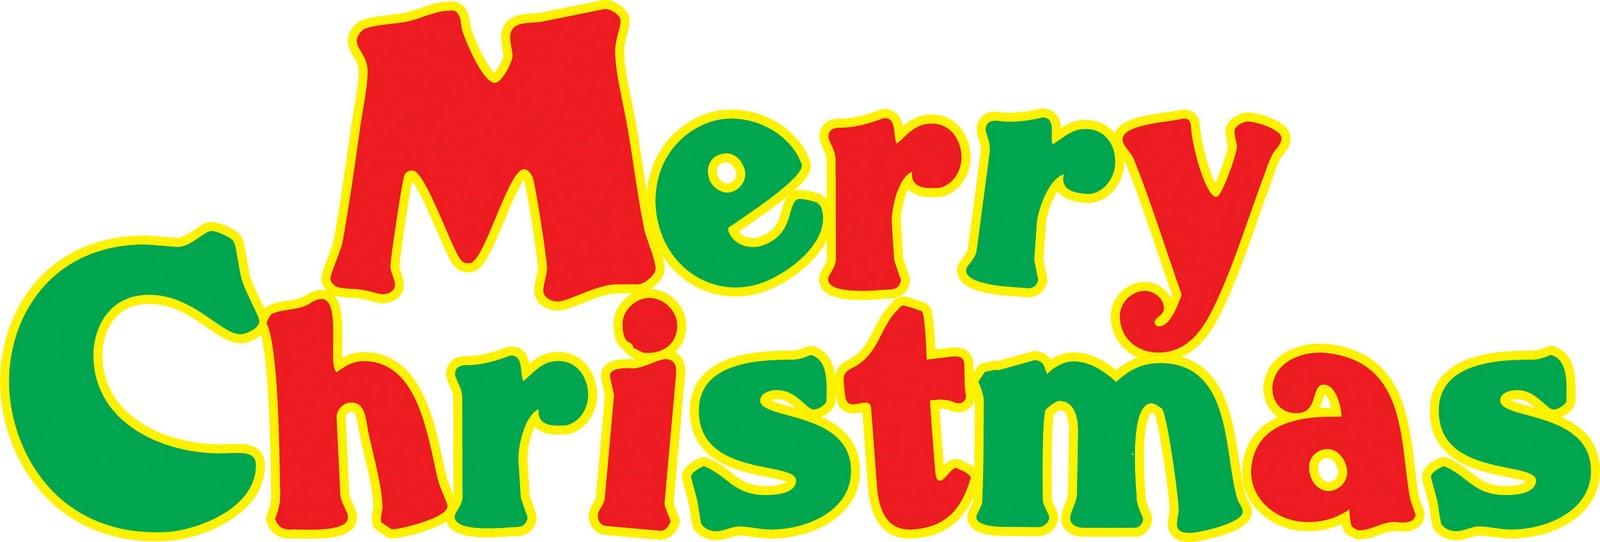 1600x542 Top 64 Merry Christmas Clip Art